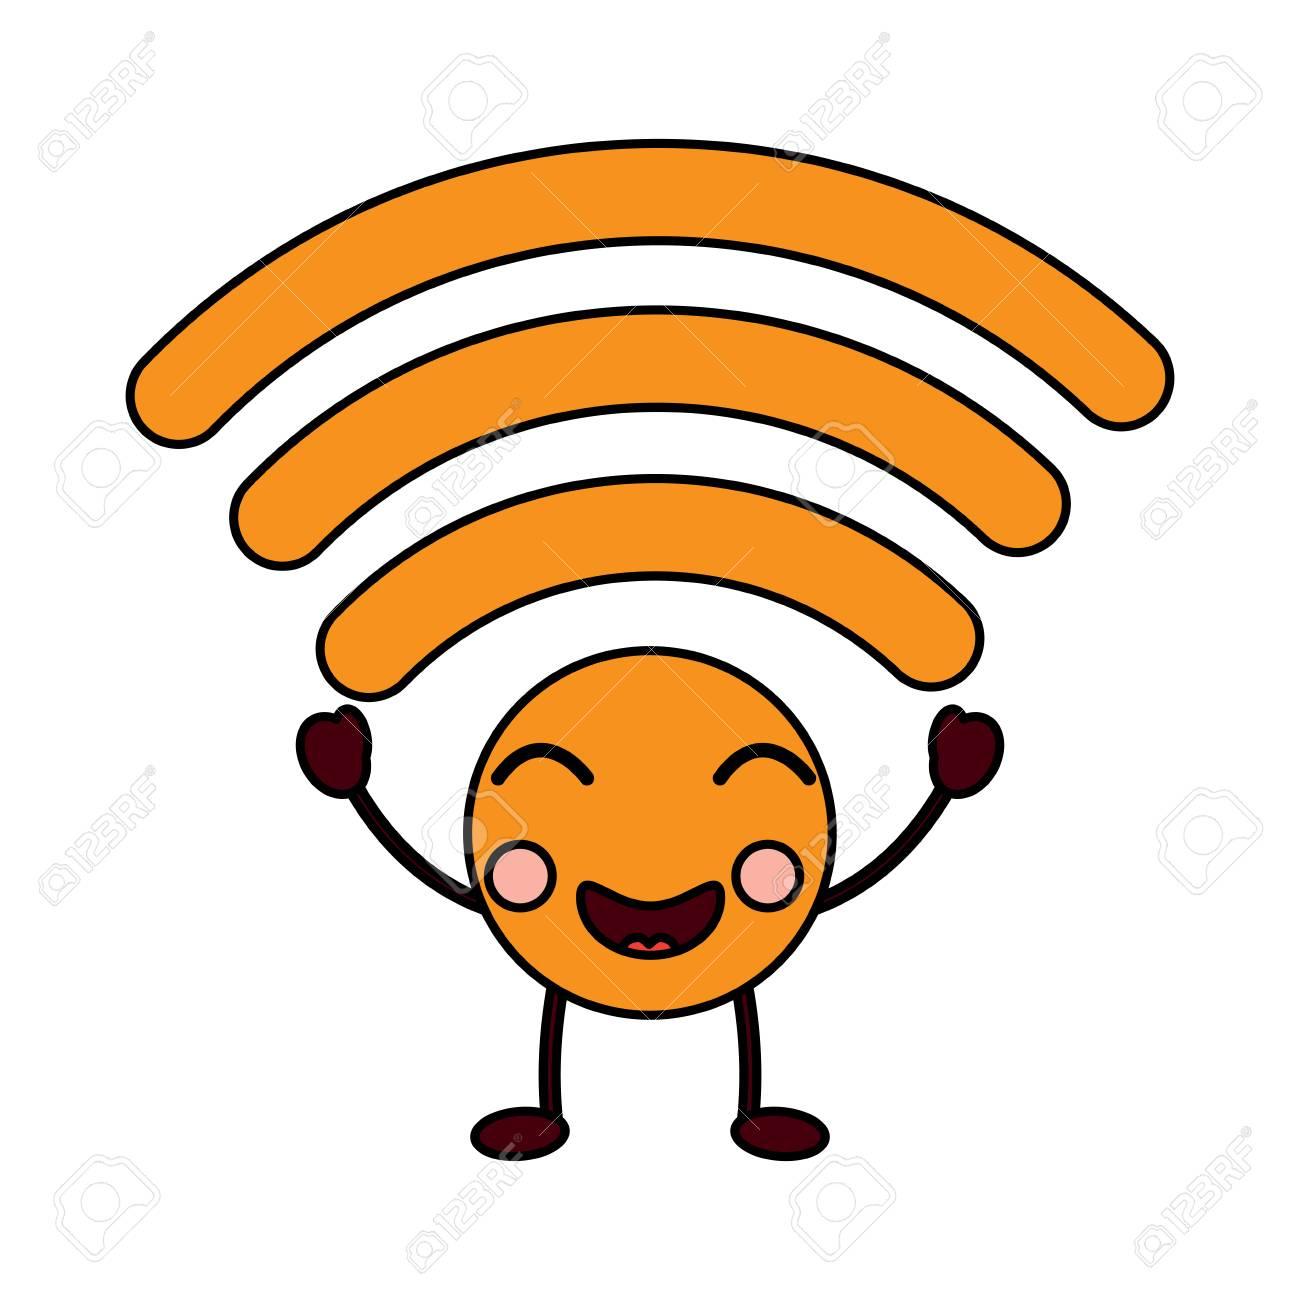 Cartoon Happy Wireless Internet Signal Kawaii Character Vector Royalty Free Cliparts Vectors And Stock Illustration Image 93511852